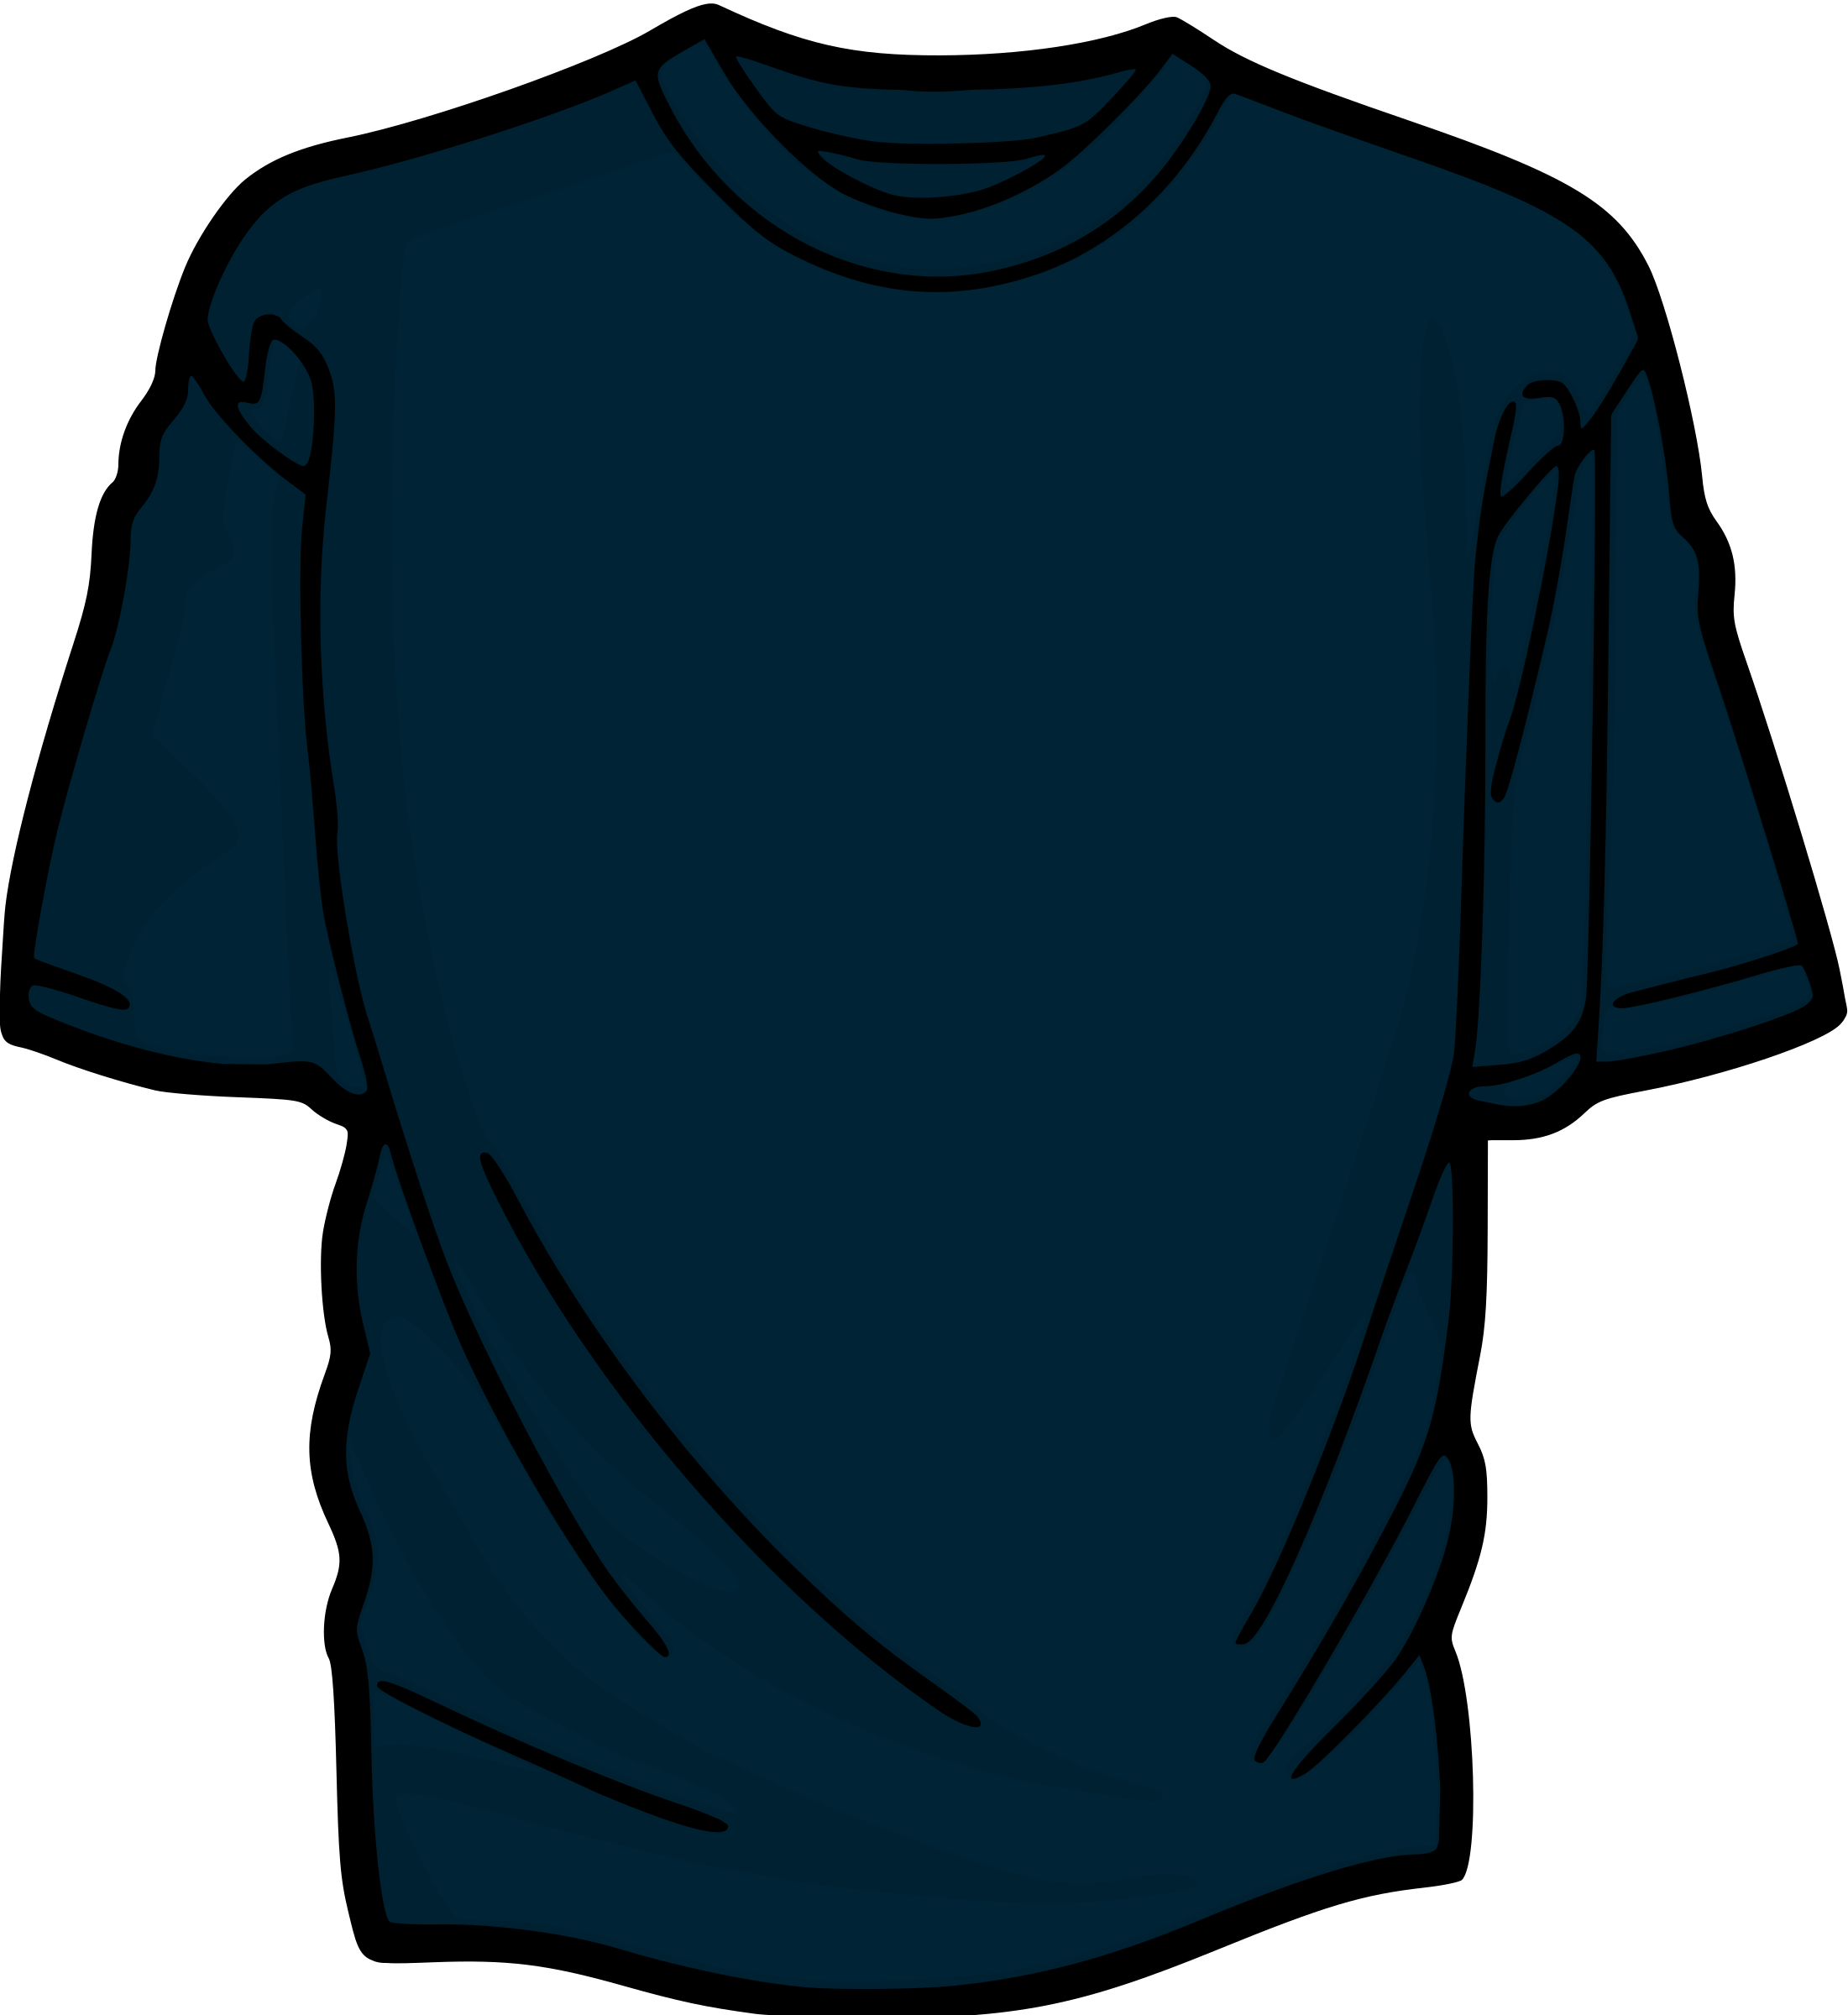 Clipart shirt clothing. Blue t big image